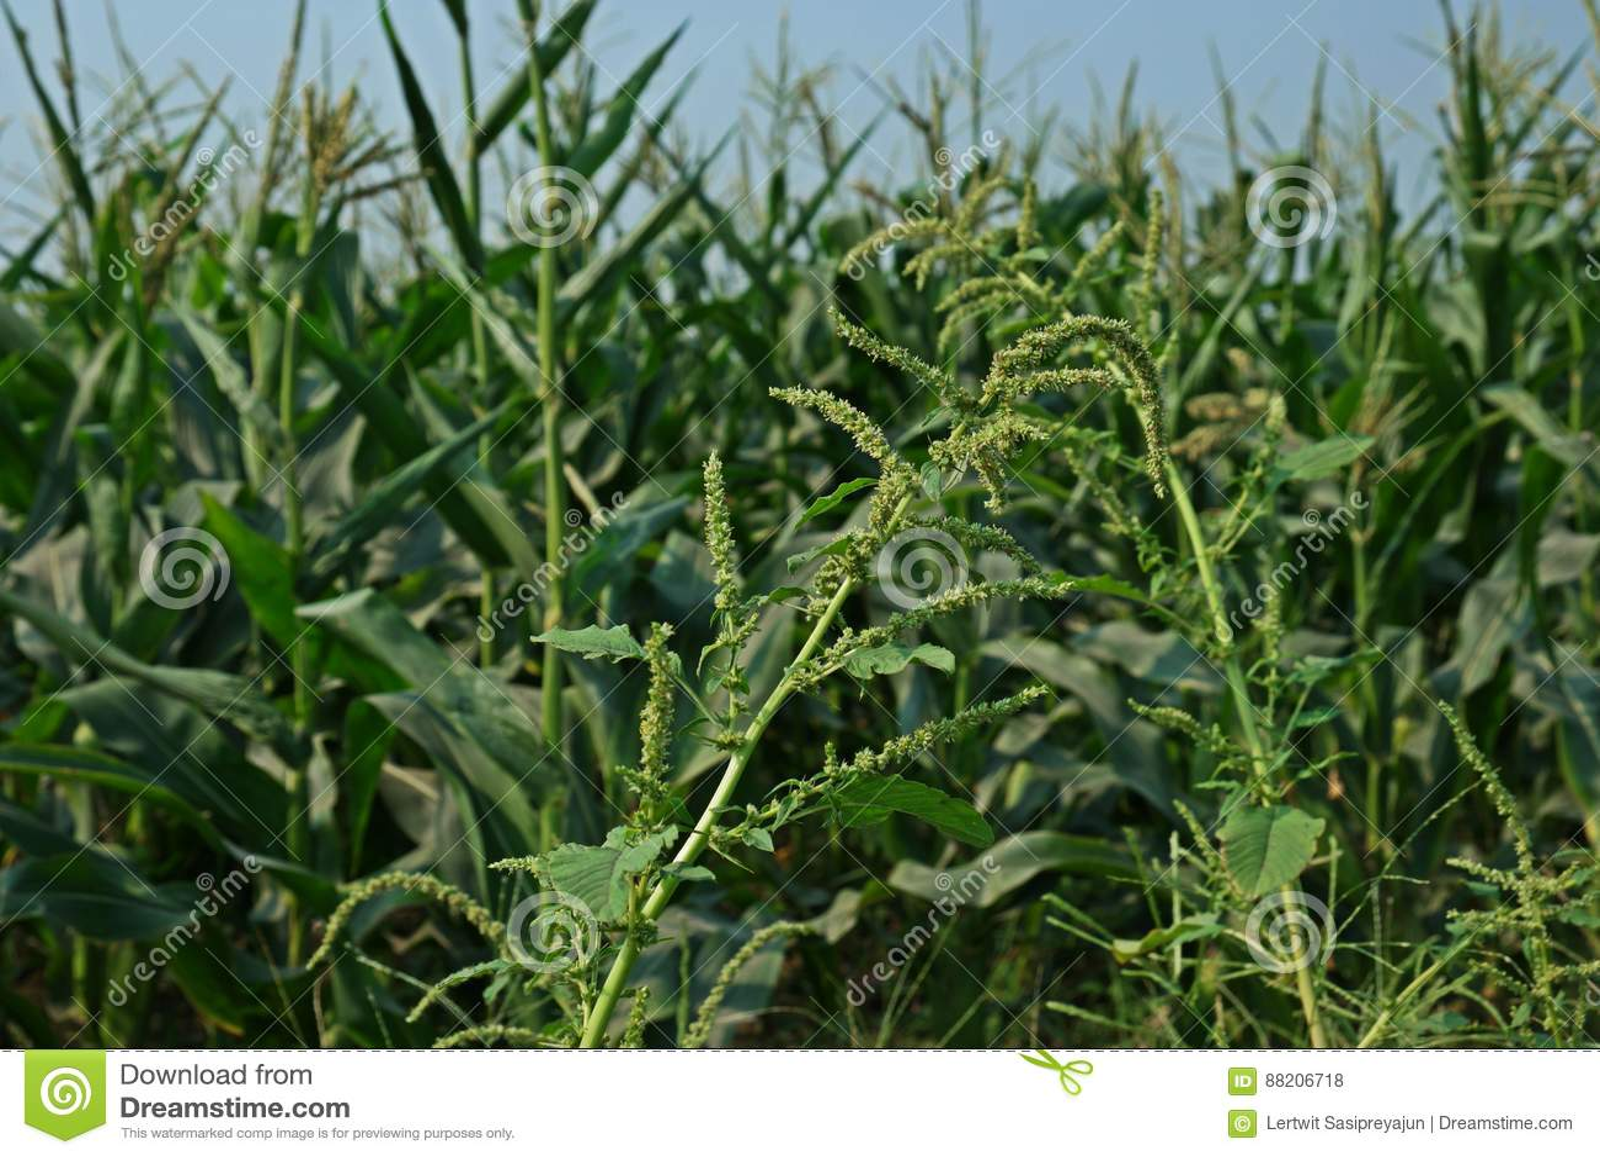 spiny amaranth or spiny pigweeda herbvegetable and broad leaf weed in agriculture filed